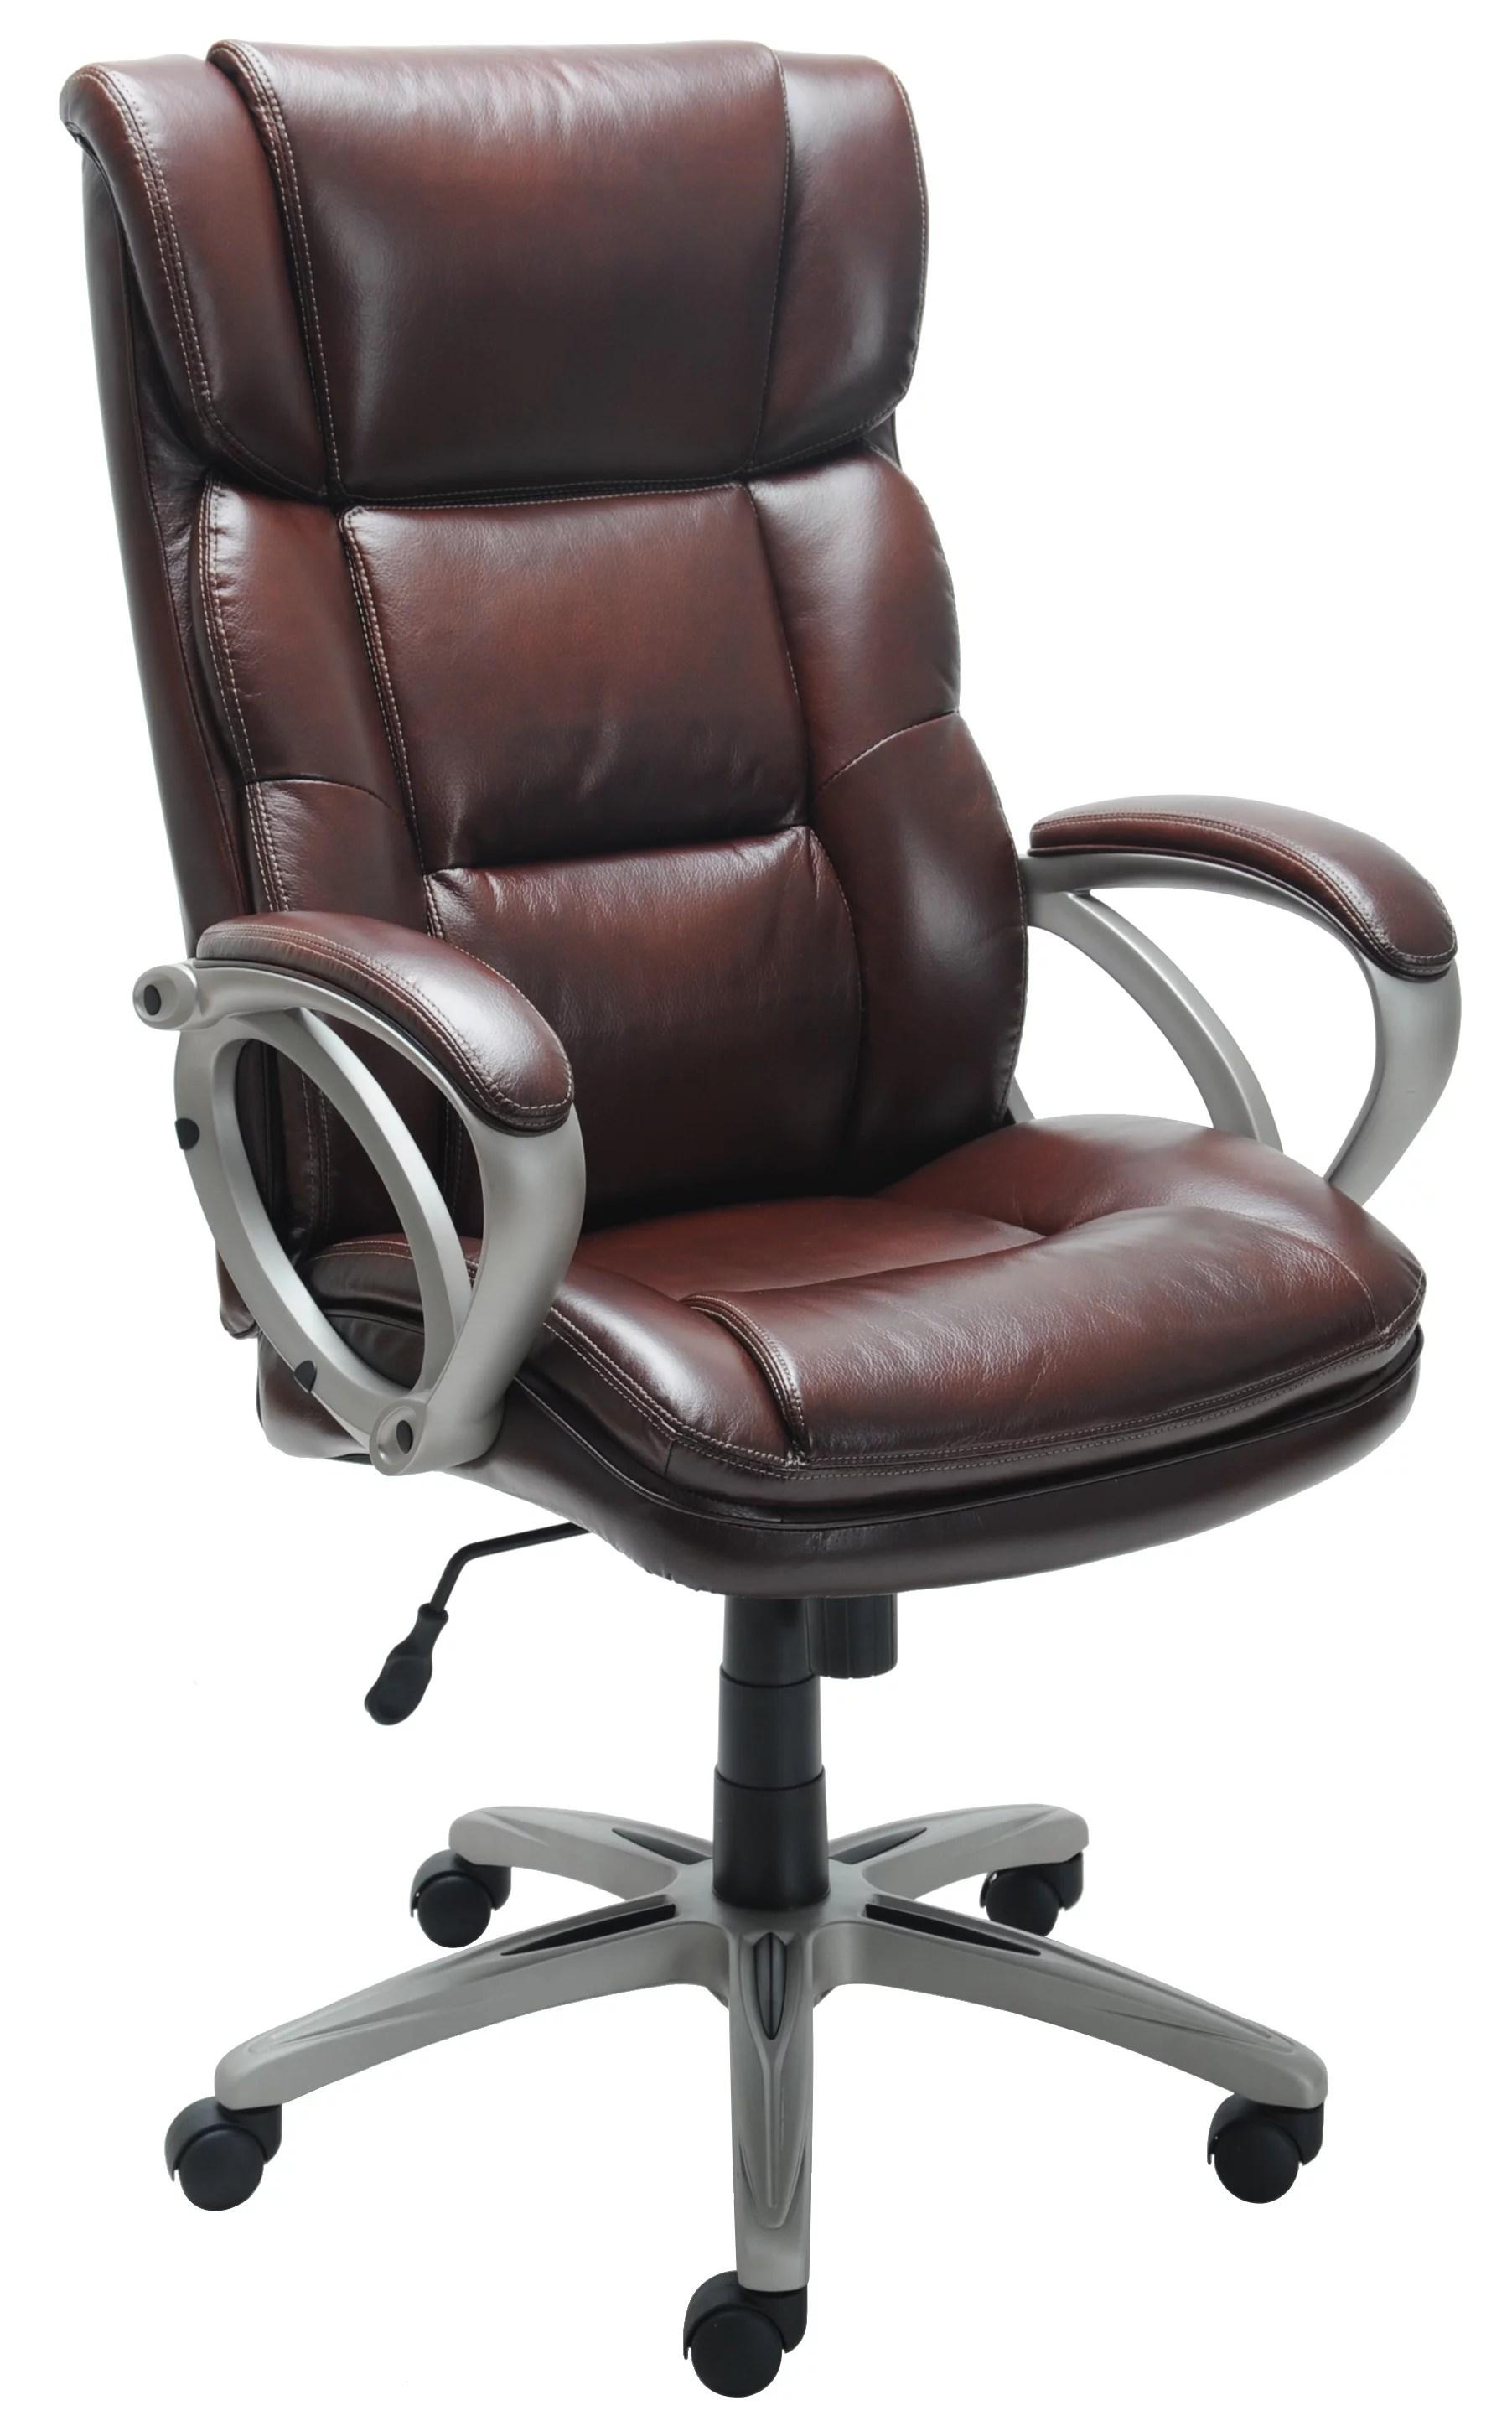 Broyhill Bonded Leather Executive Chair  Walmartcom